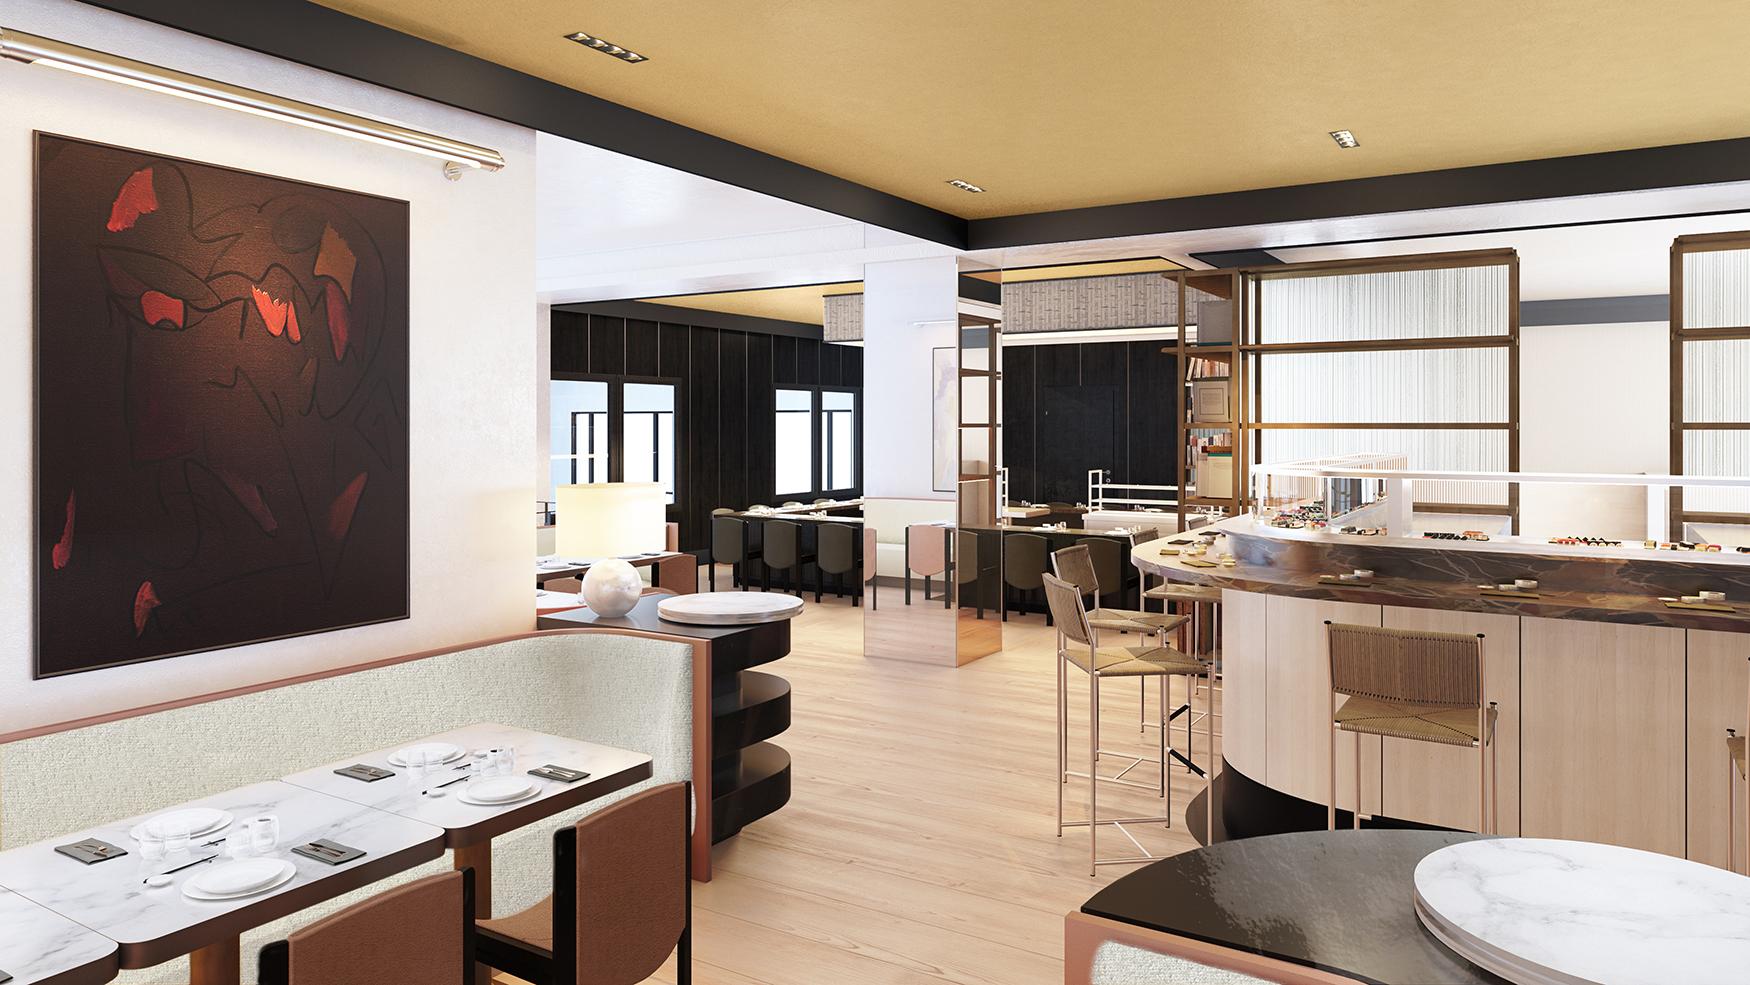 sandrine sarah faivre-architecture-interieure-chilling-2019-HONO-Riyadh-2-XXL